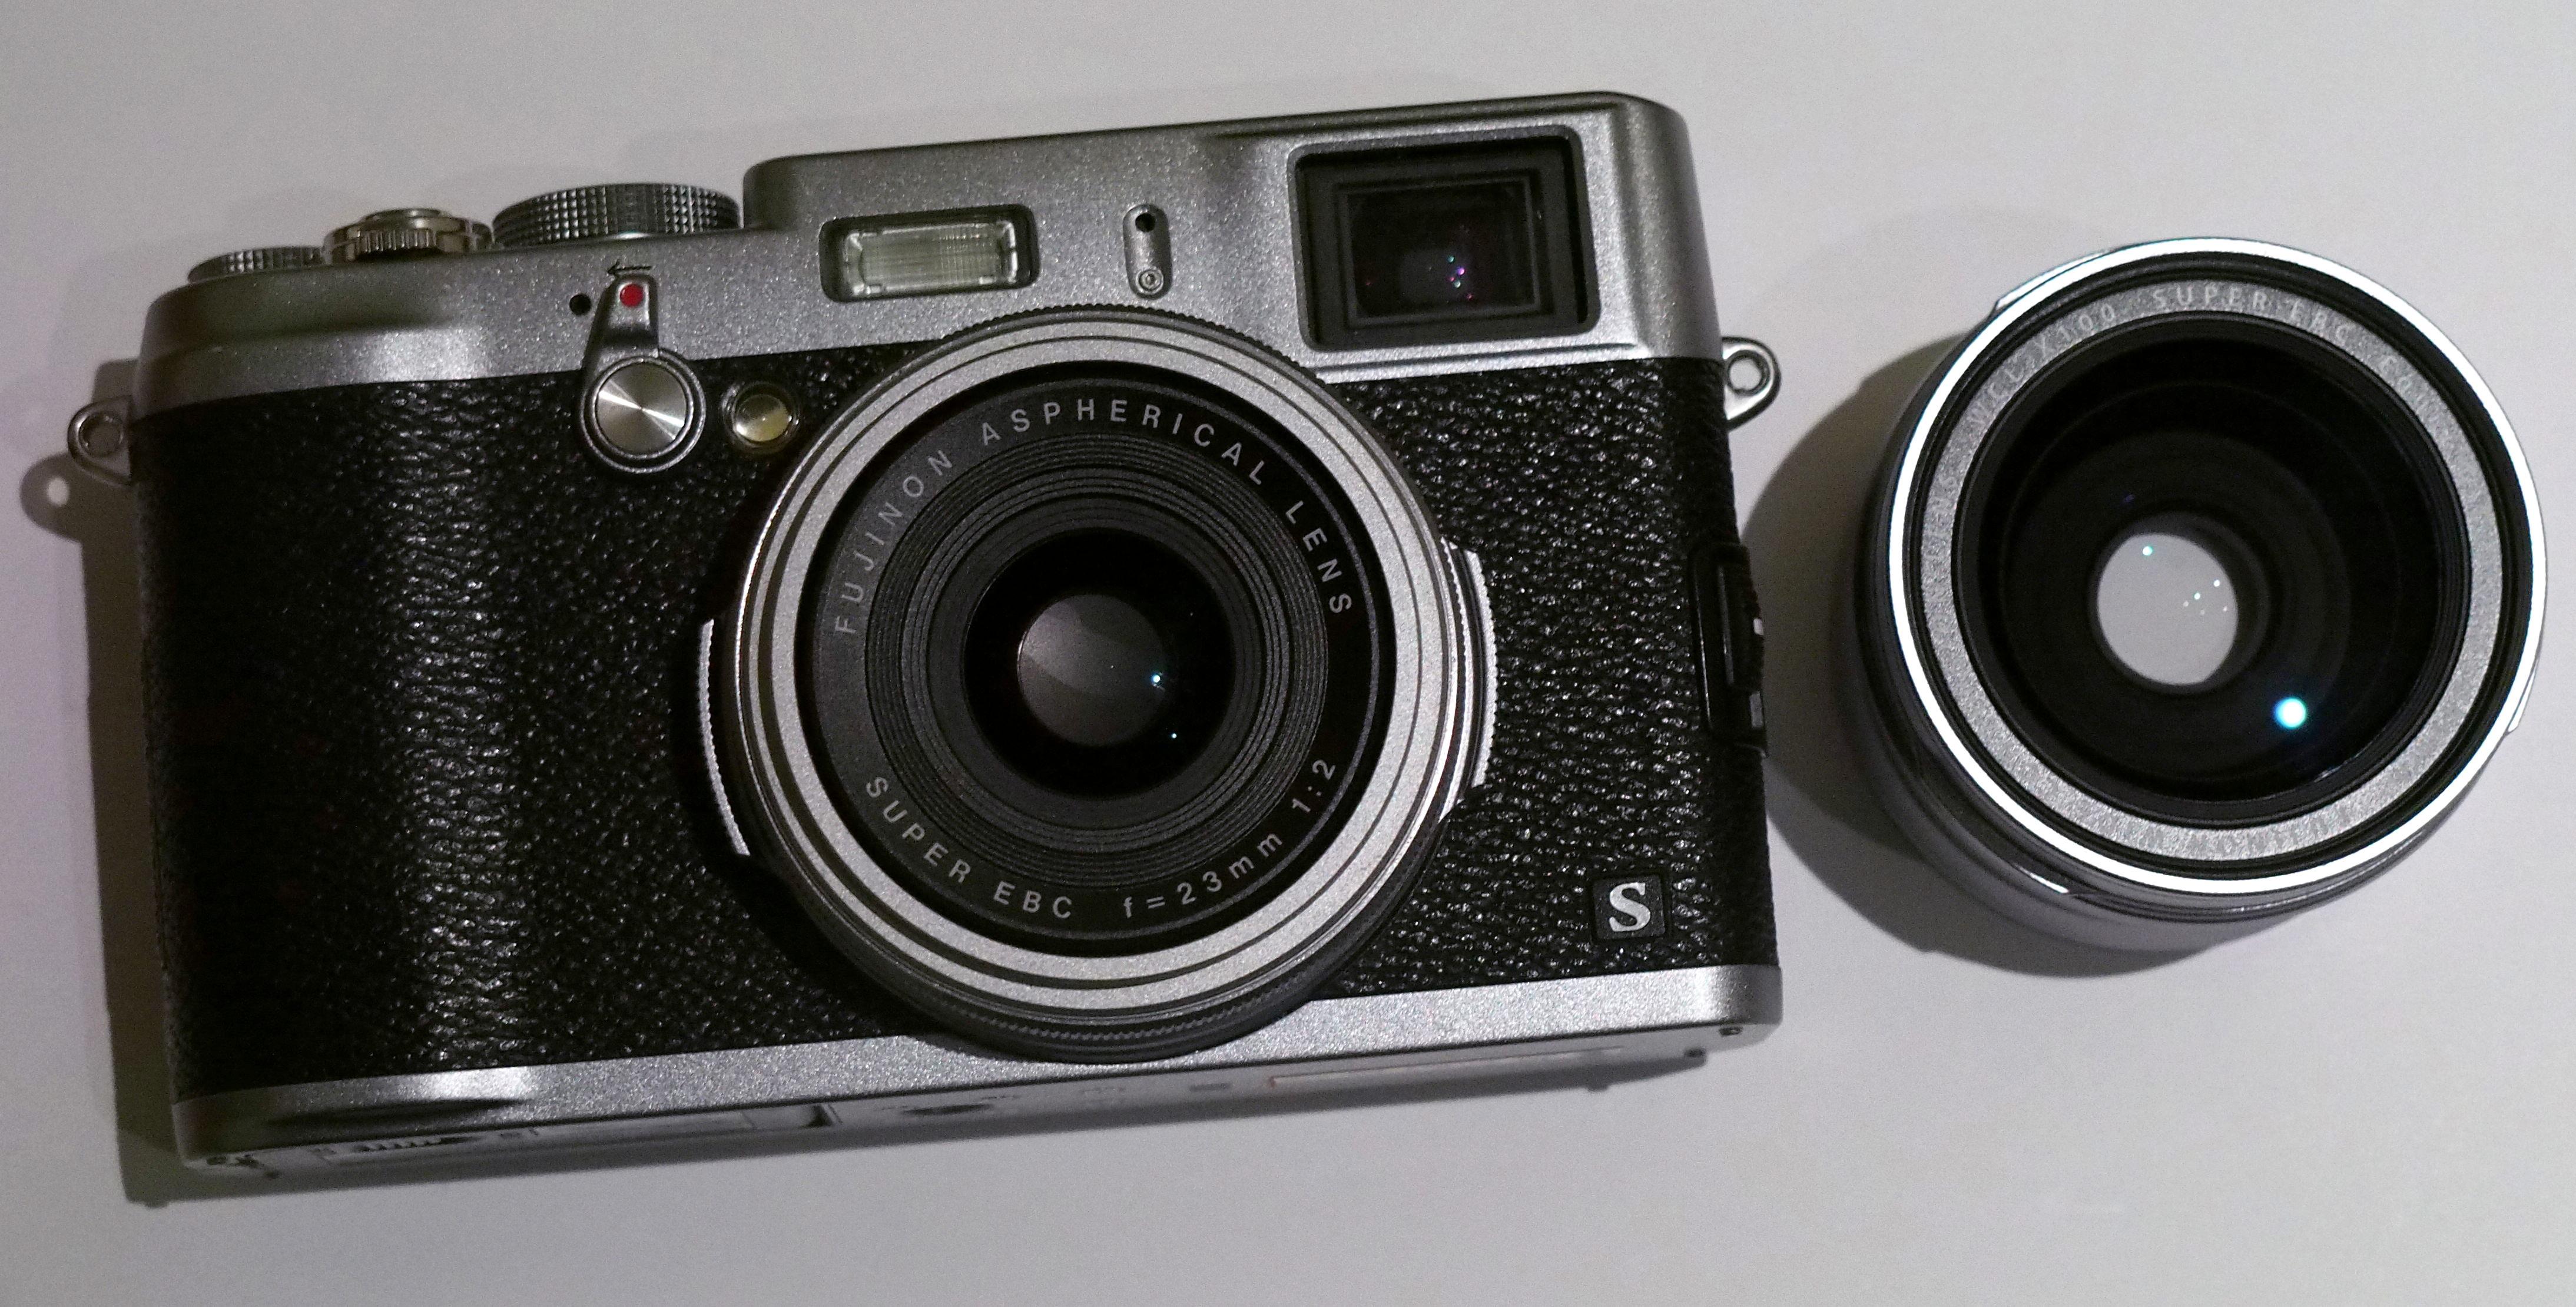 富士x100富士x100s_Fujifilm X100s WCL-X100 Wide Angle Converter Preview   ePHOTOzine